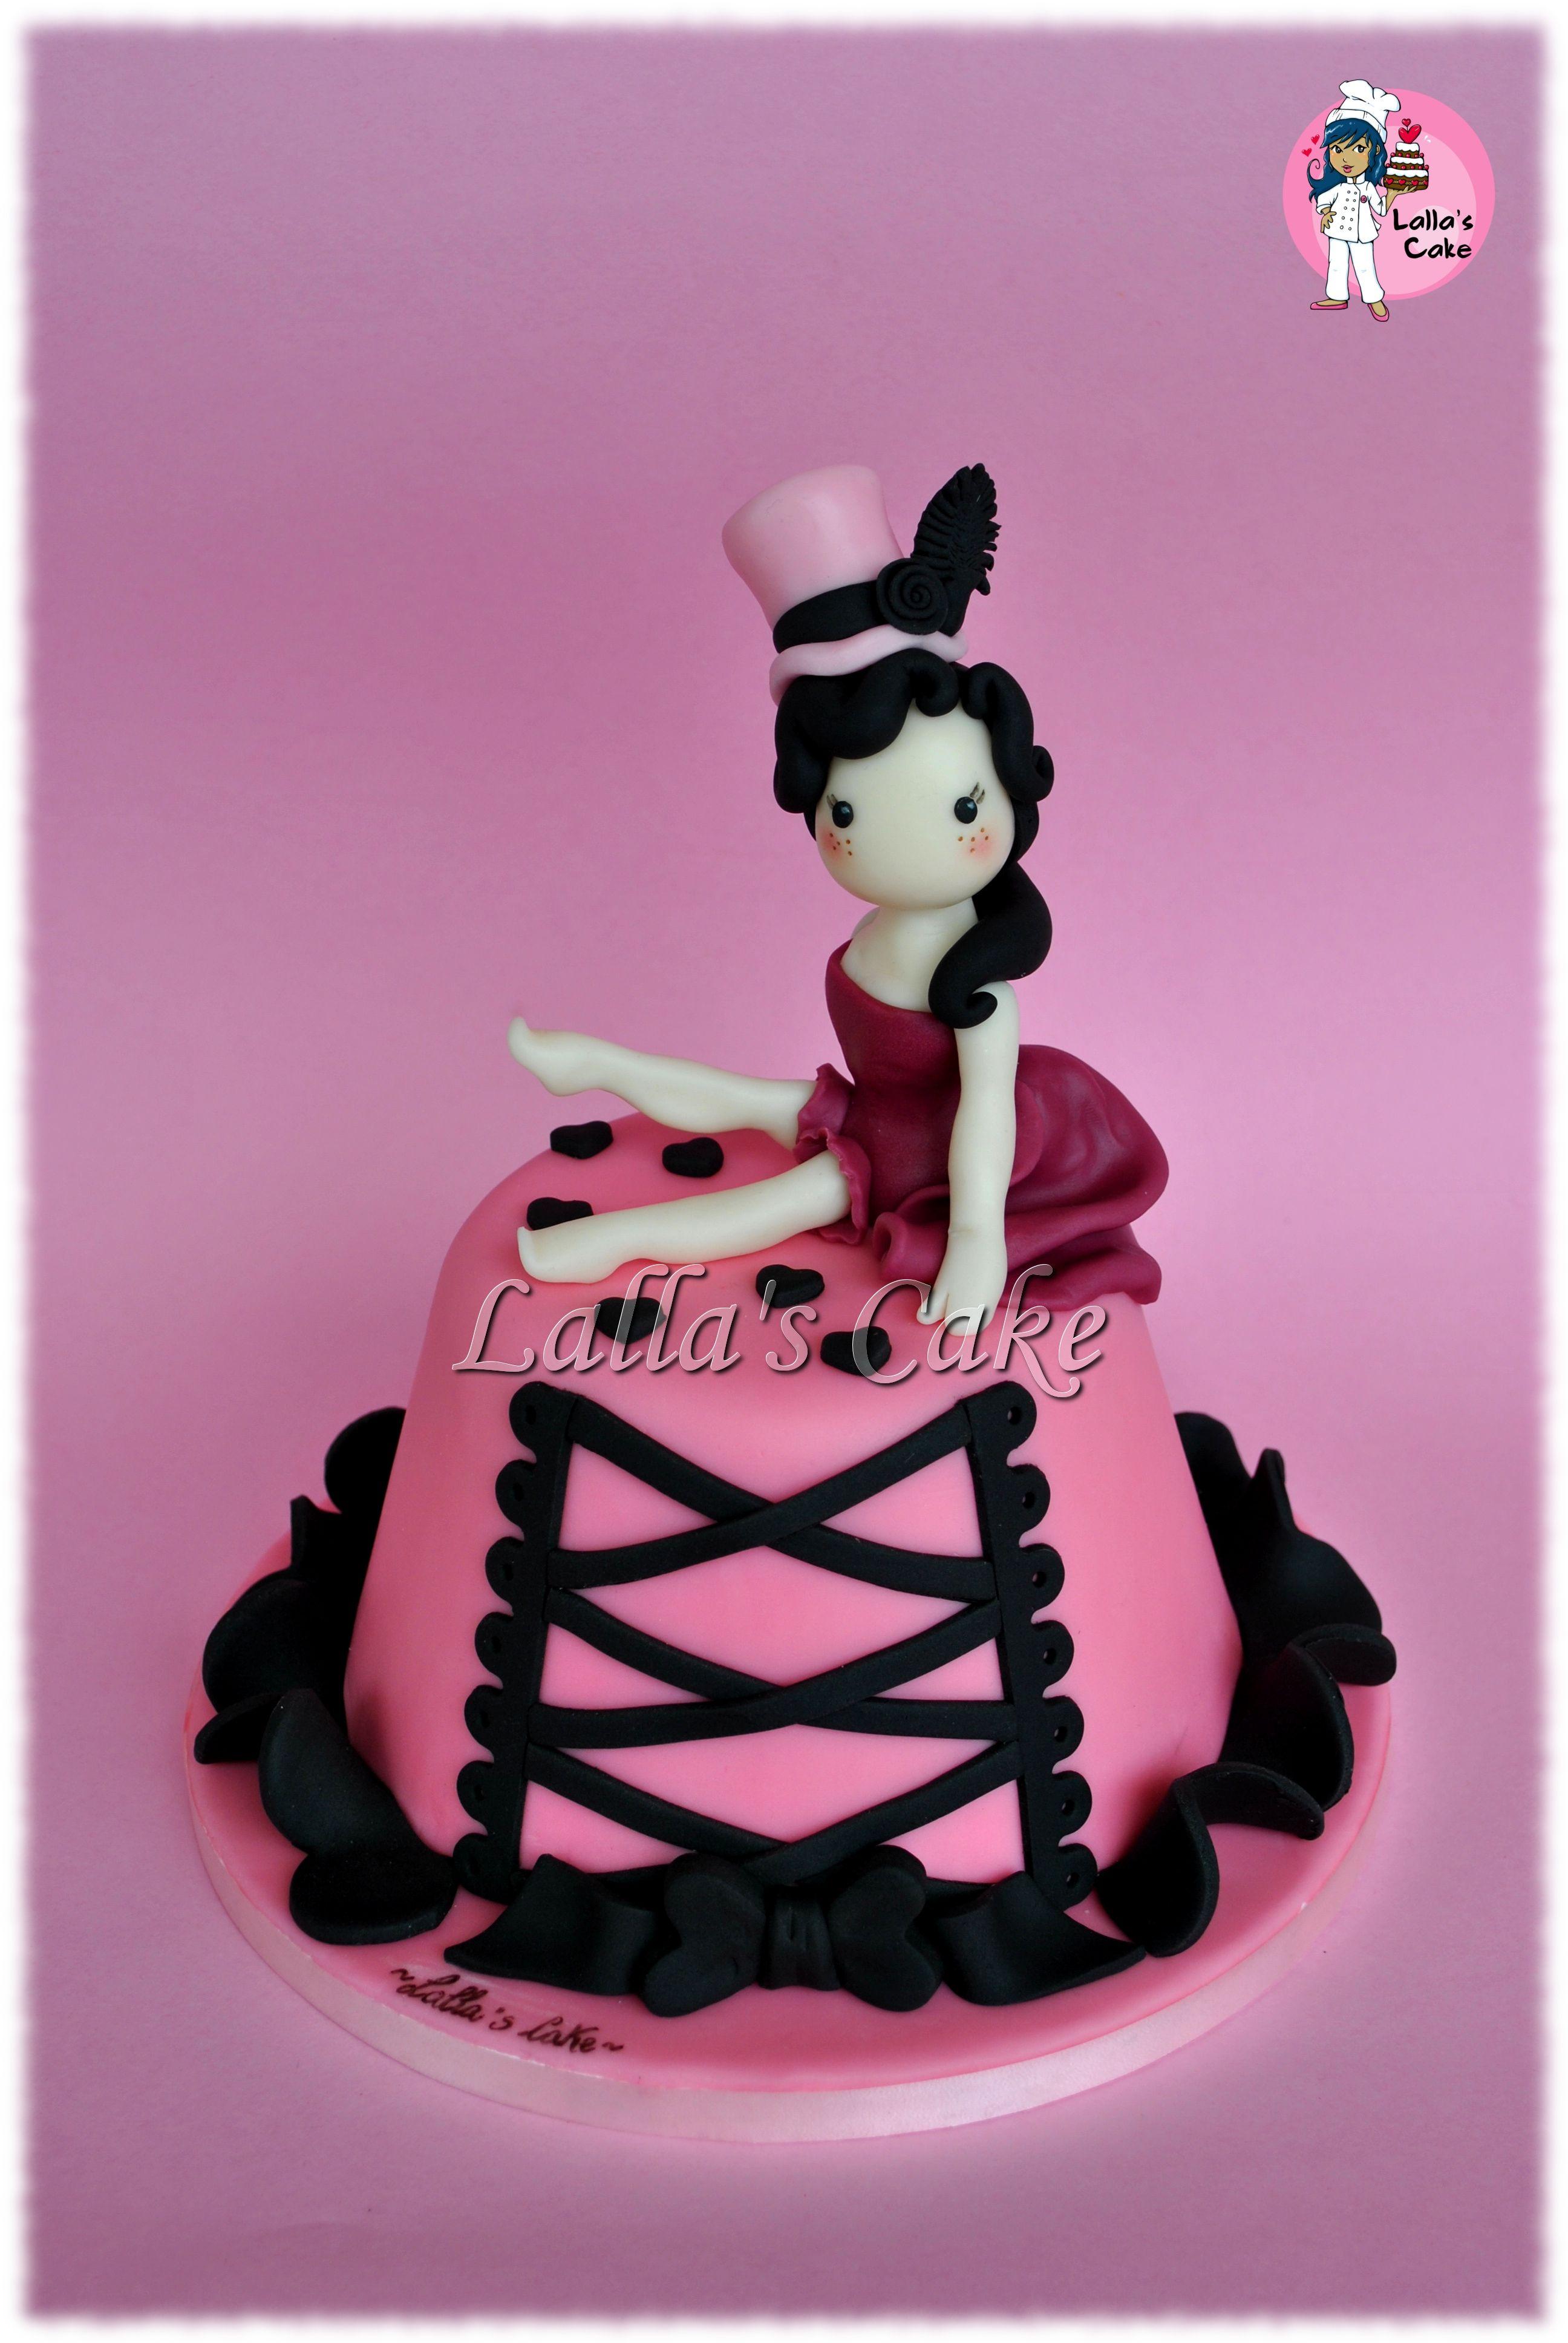 Burlesque Cake  cake design, pasta di zucchero, sugar paste, lalla's cake